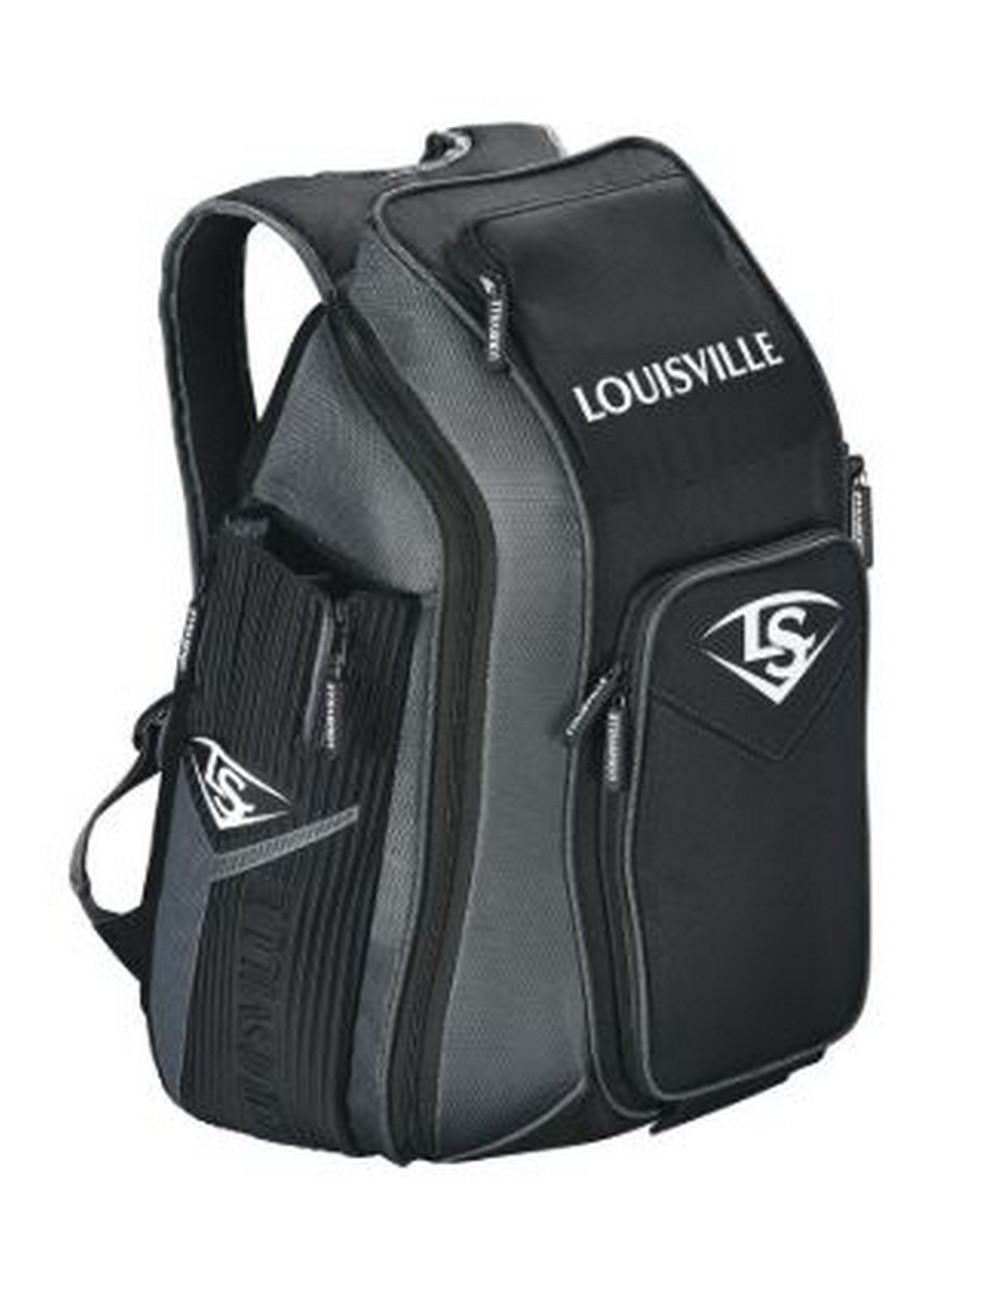 Louisville Slugger Series 7 Select Stick Pack Bat Pack